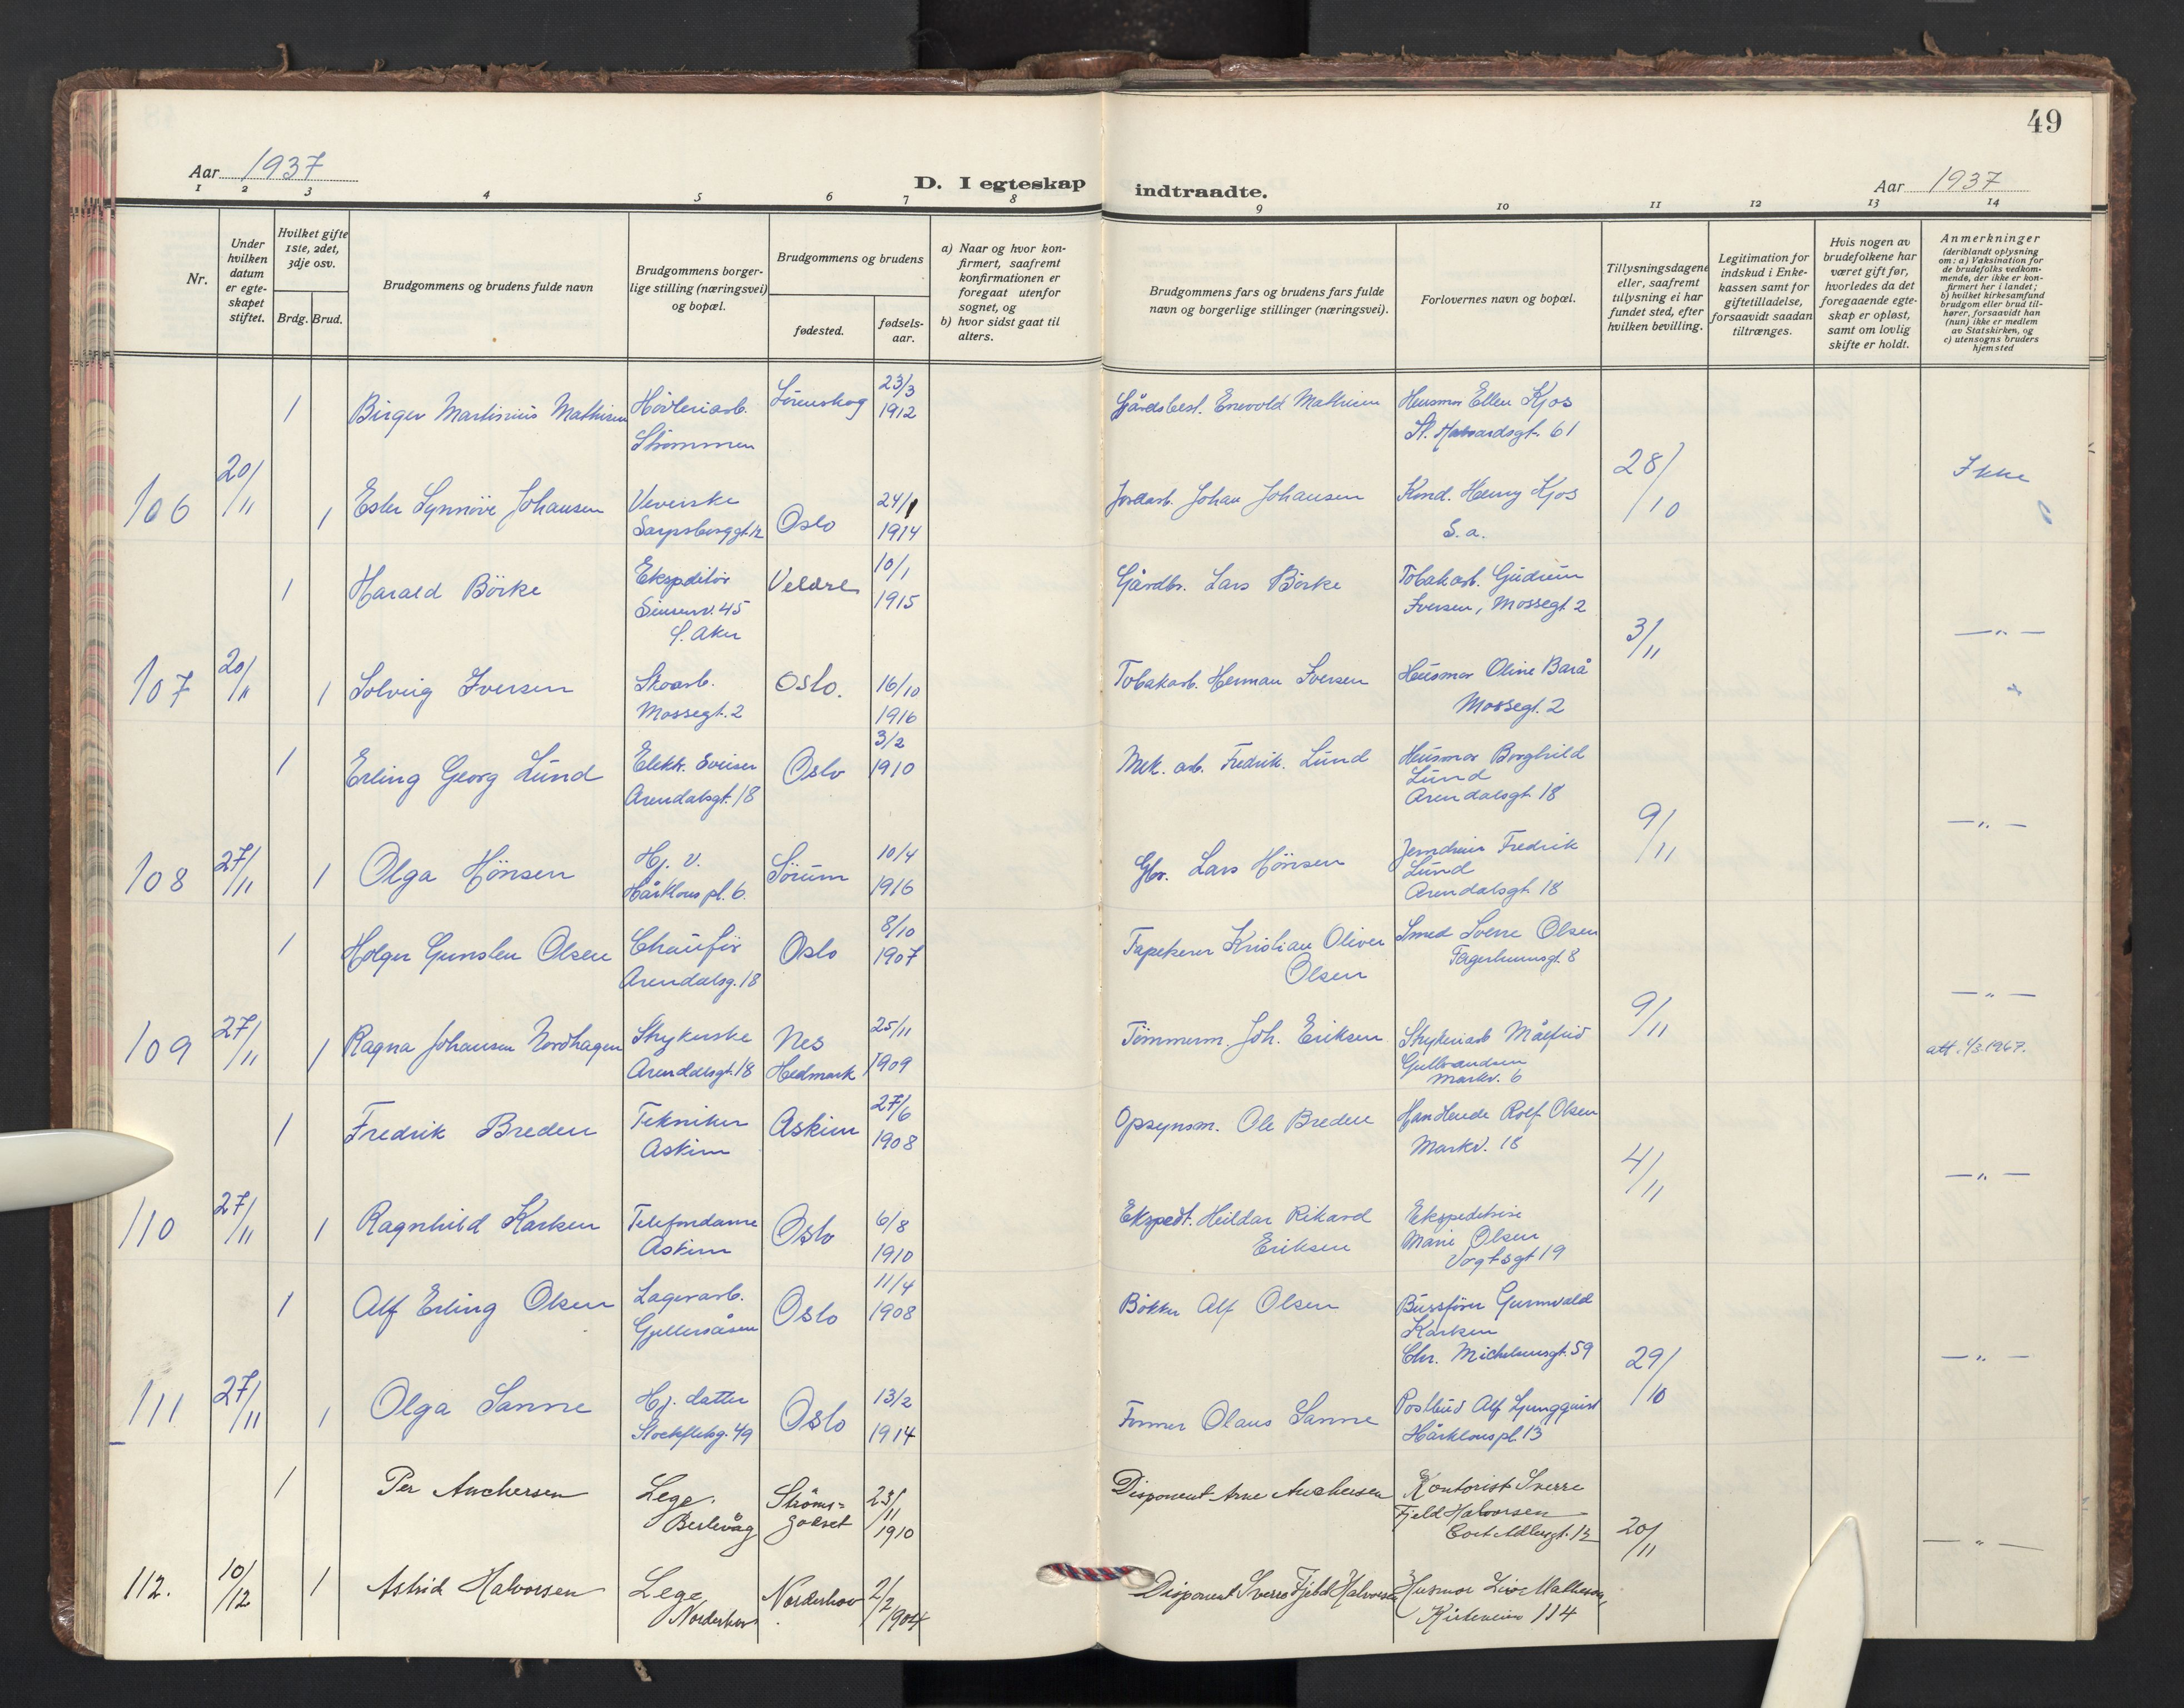 SAO, Sagene prestekontor Kirkebøker, F/L0018: Parish register (official) no. 18, 1935-1940, p. 49